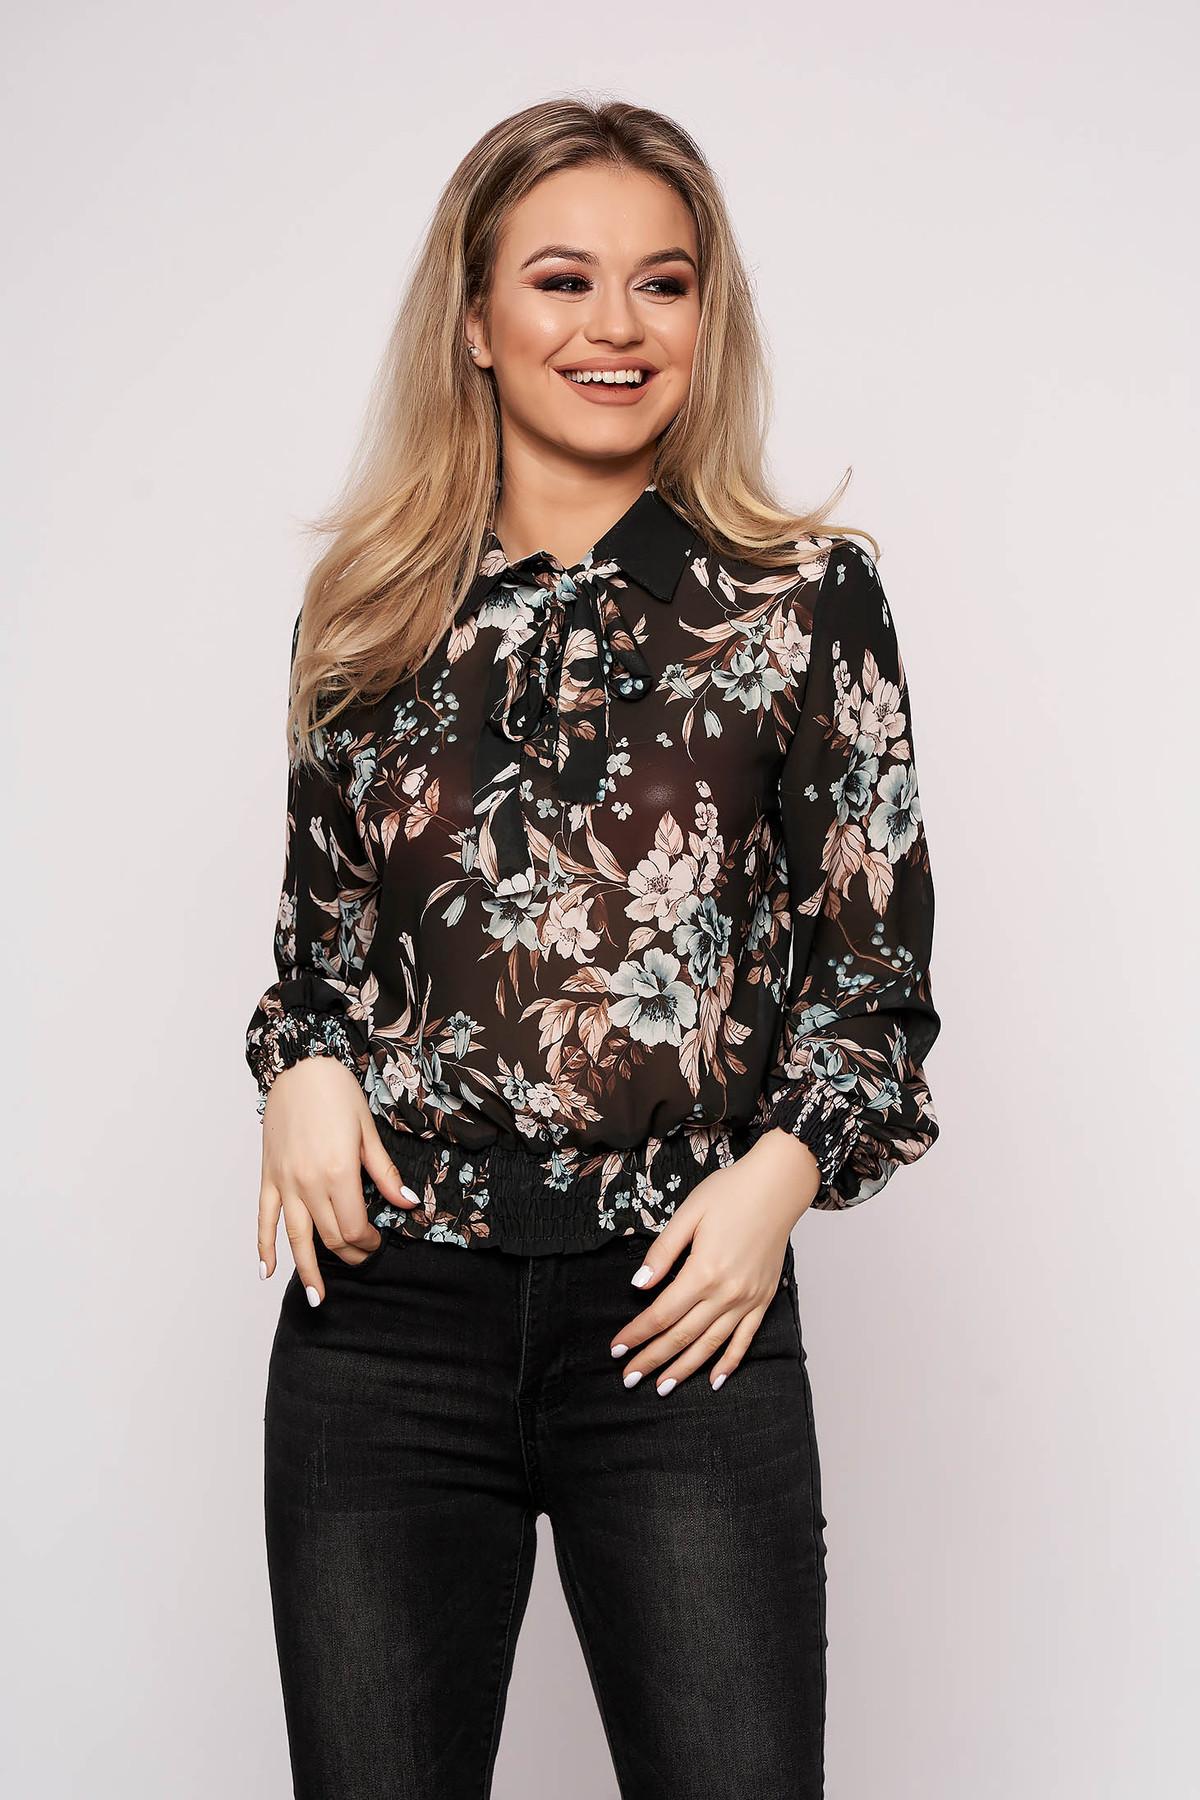 Bluza dama neagra SunShine casual cu maneca lunga cu croi larg scurta din voal cu imprimeu floral